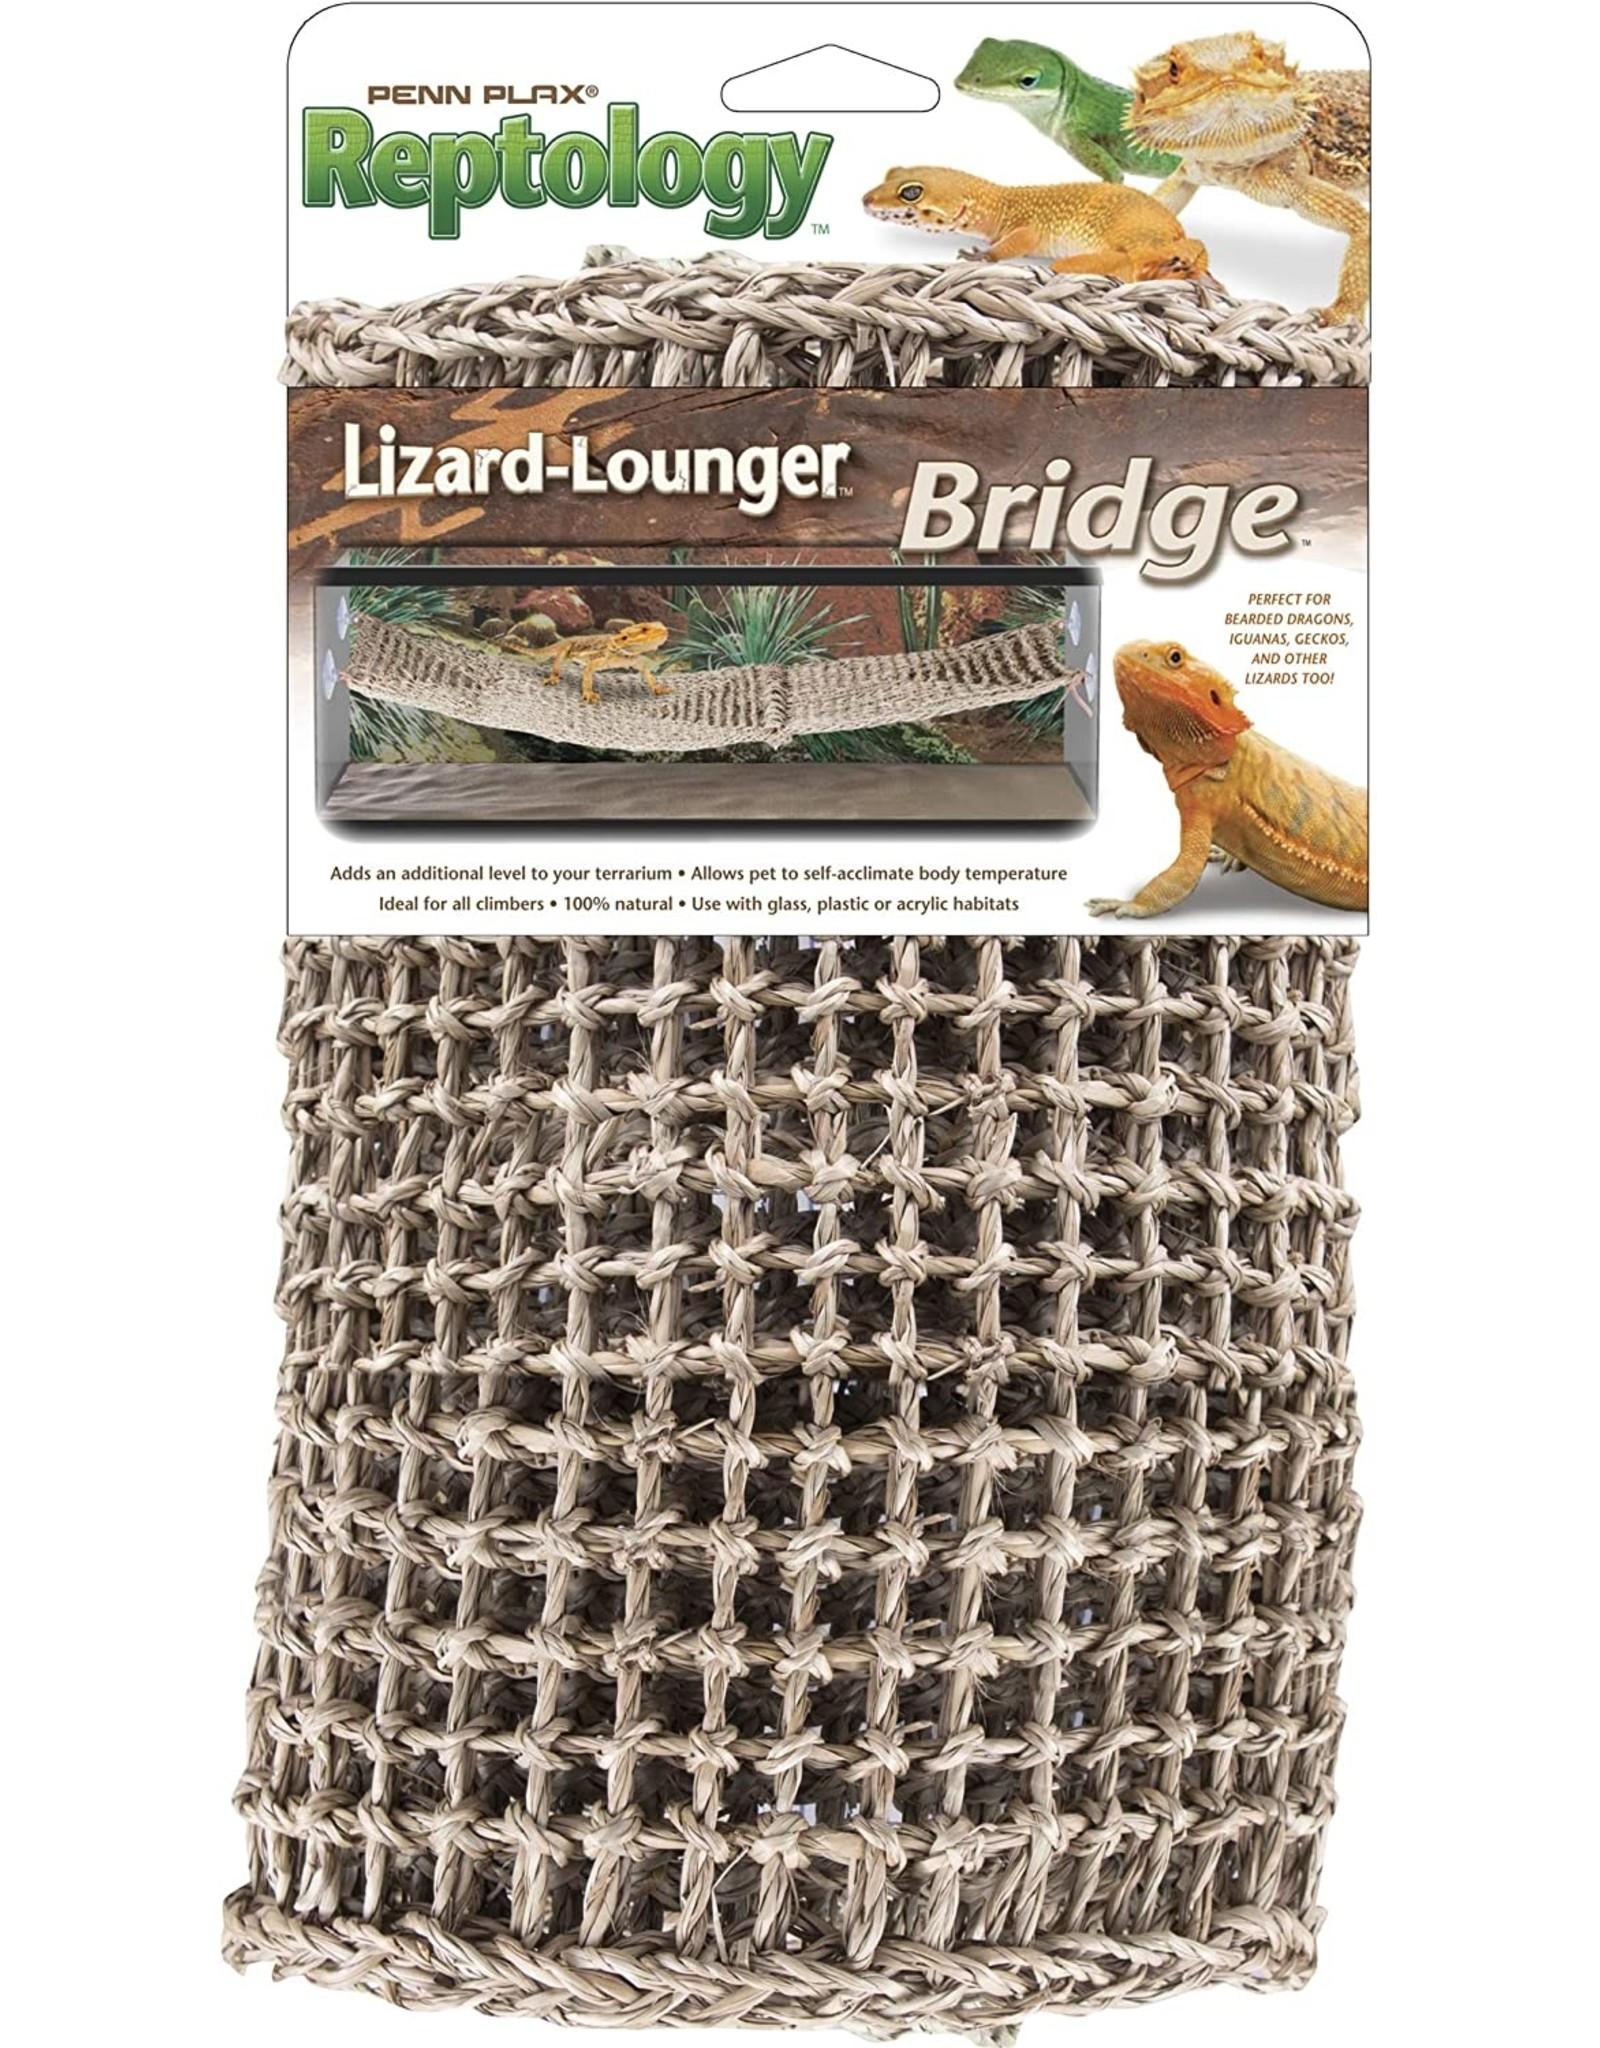 Penn Plax PENN PLAX Natural Lizard Lounger Bridge